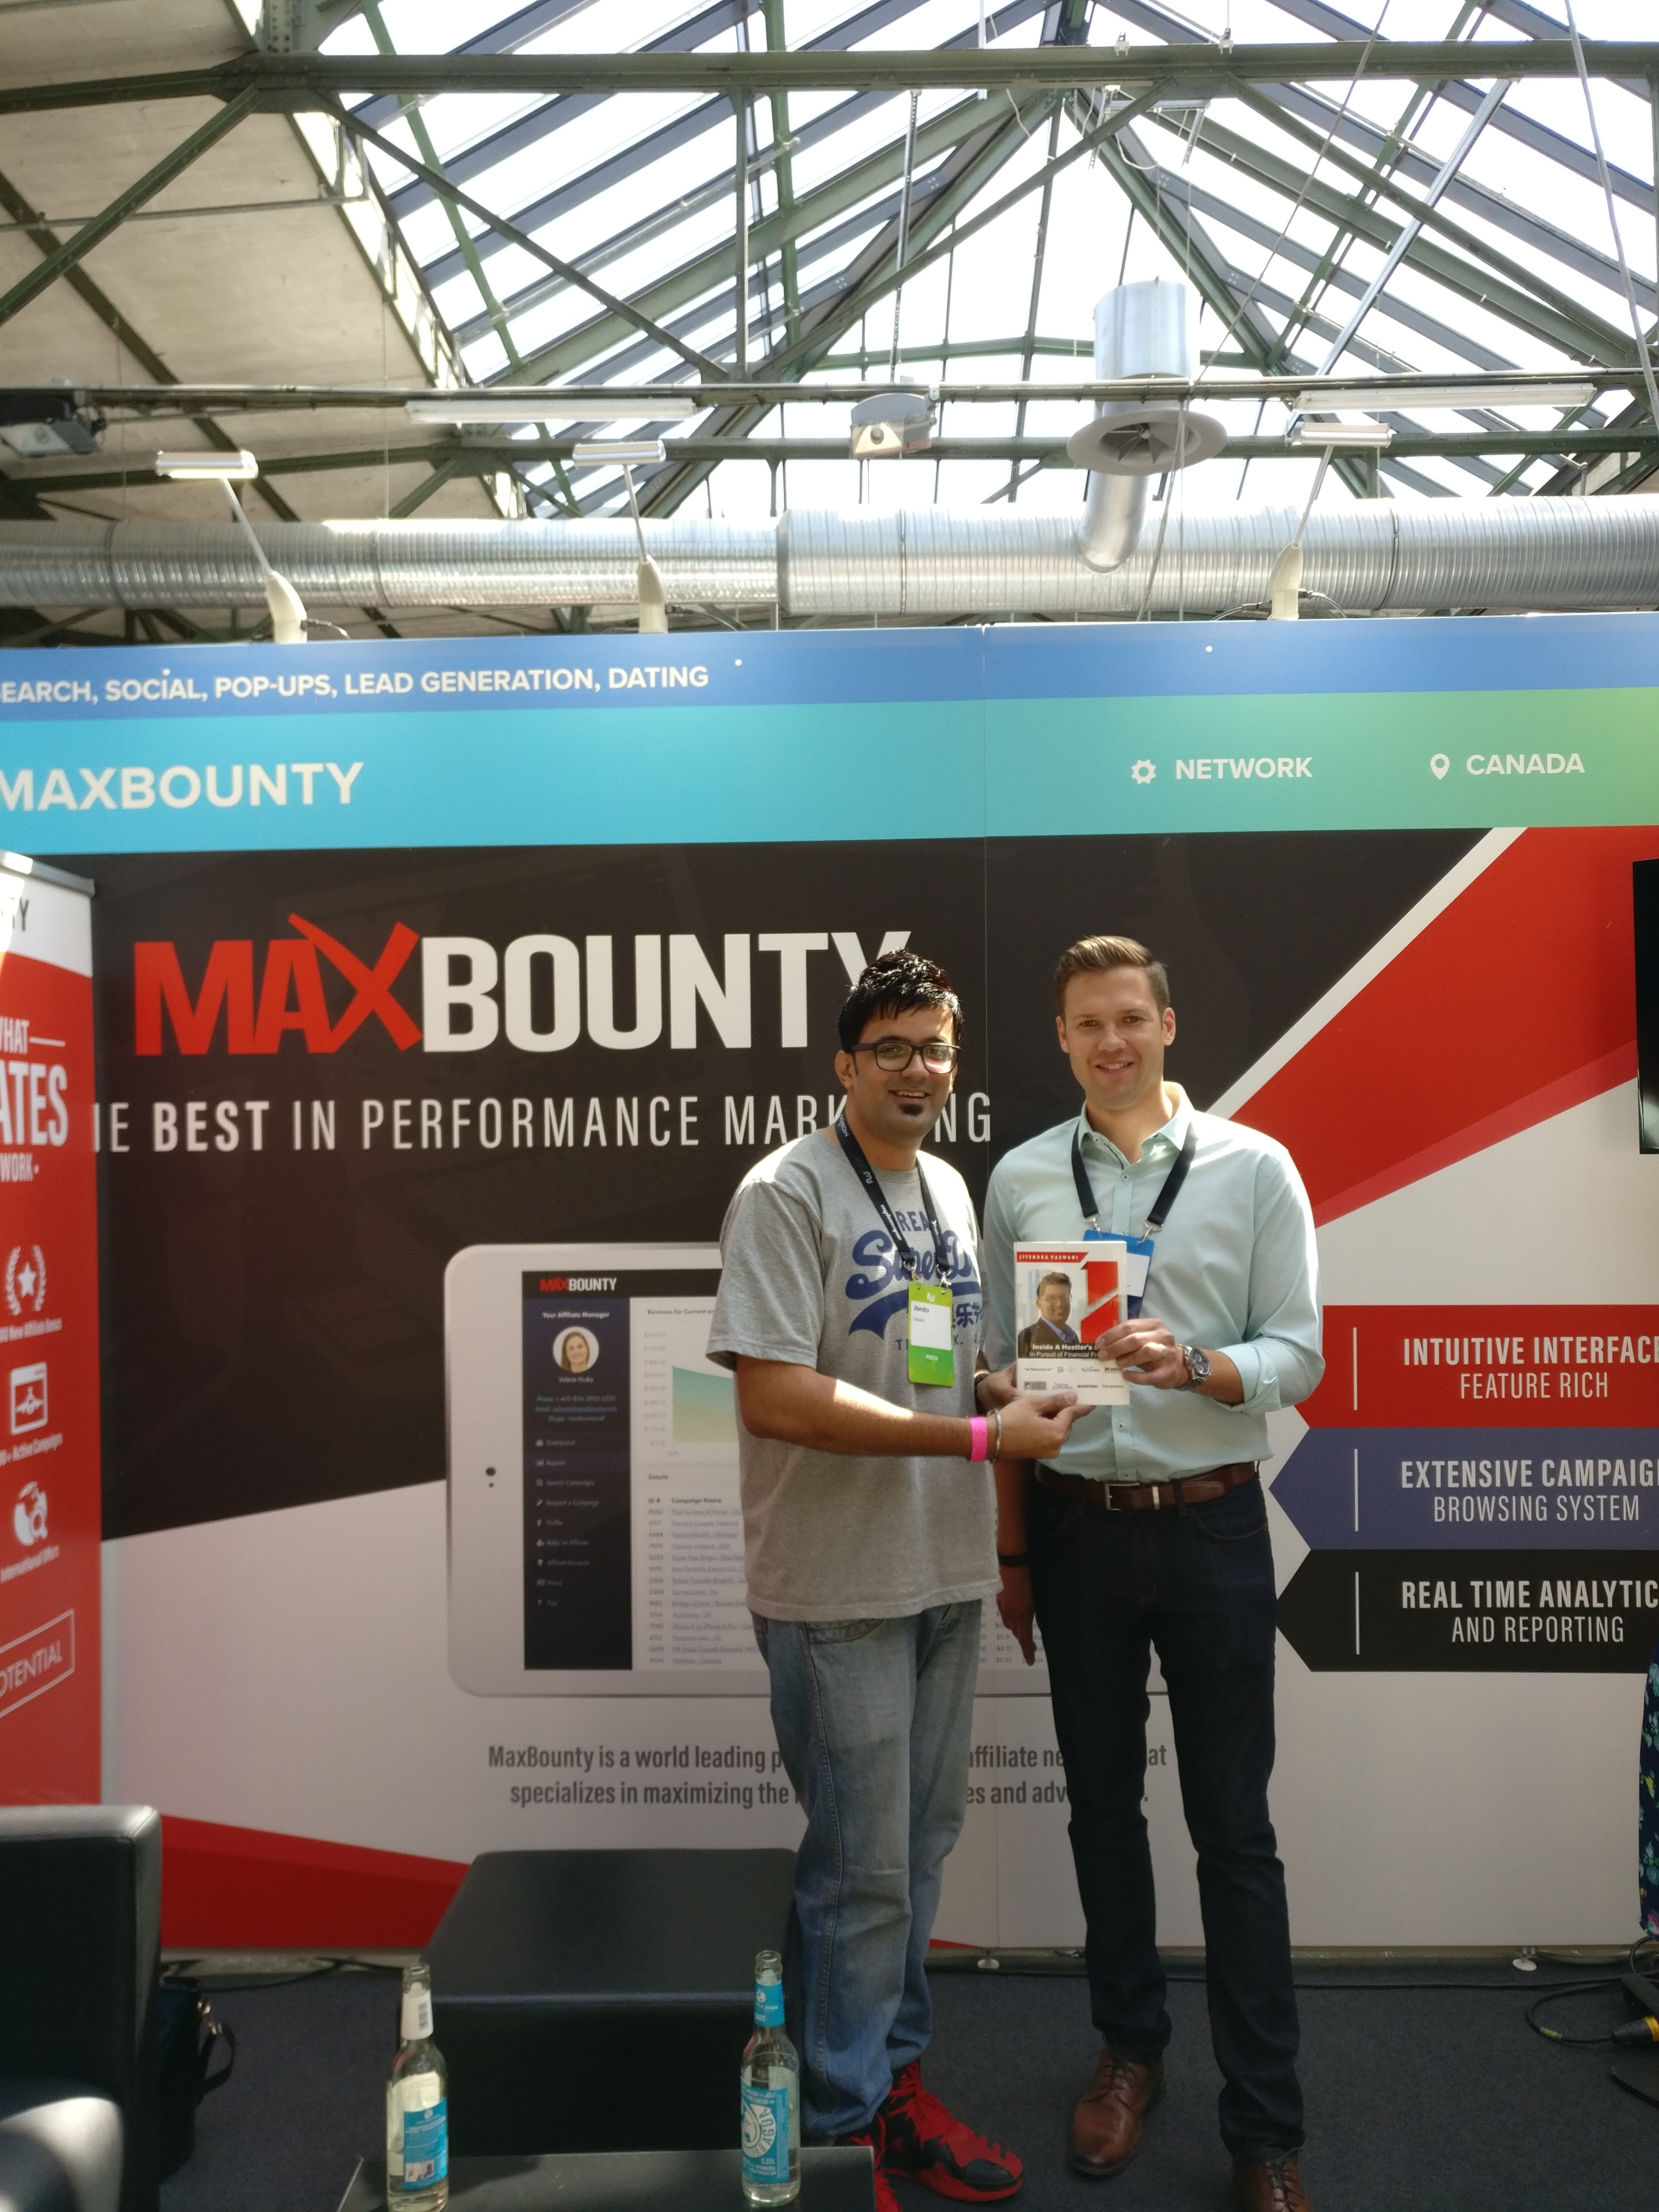 Matt CEO of MaxBounty